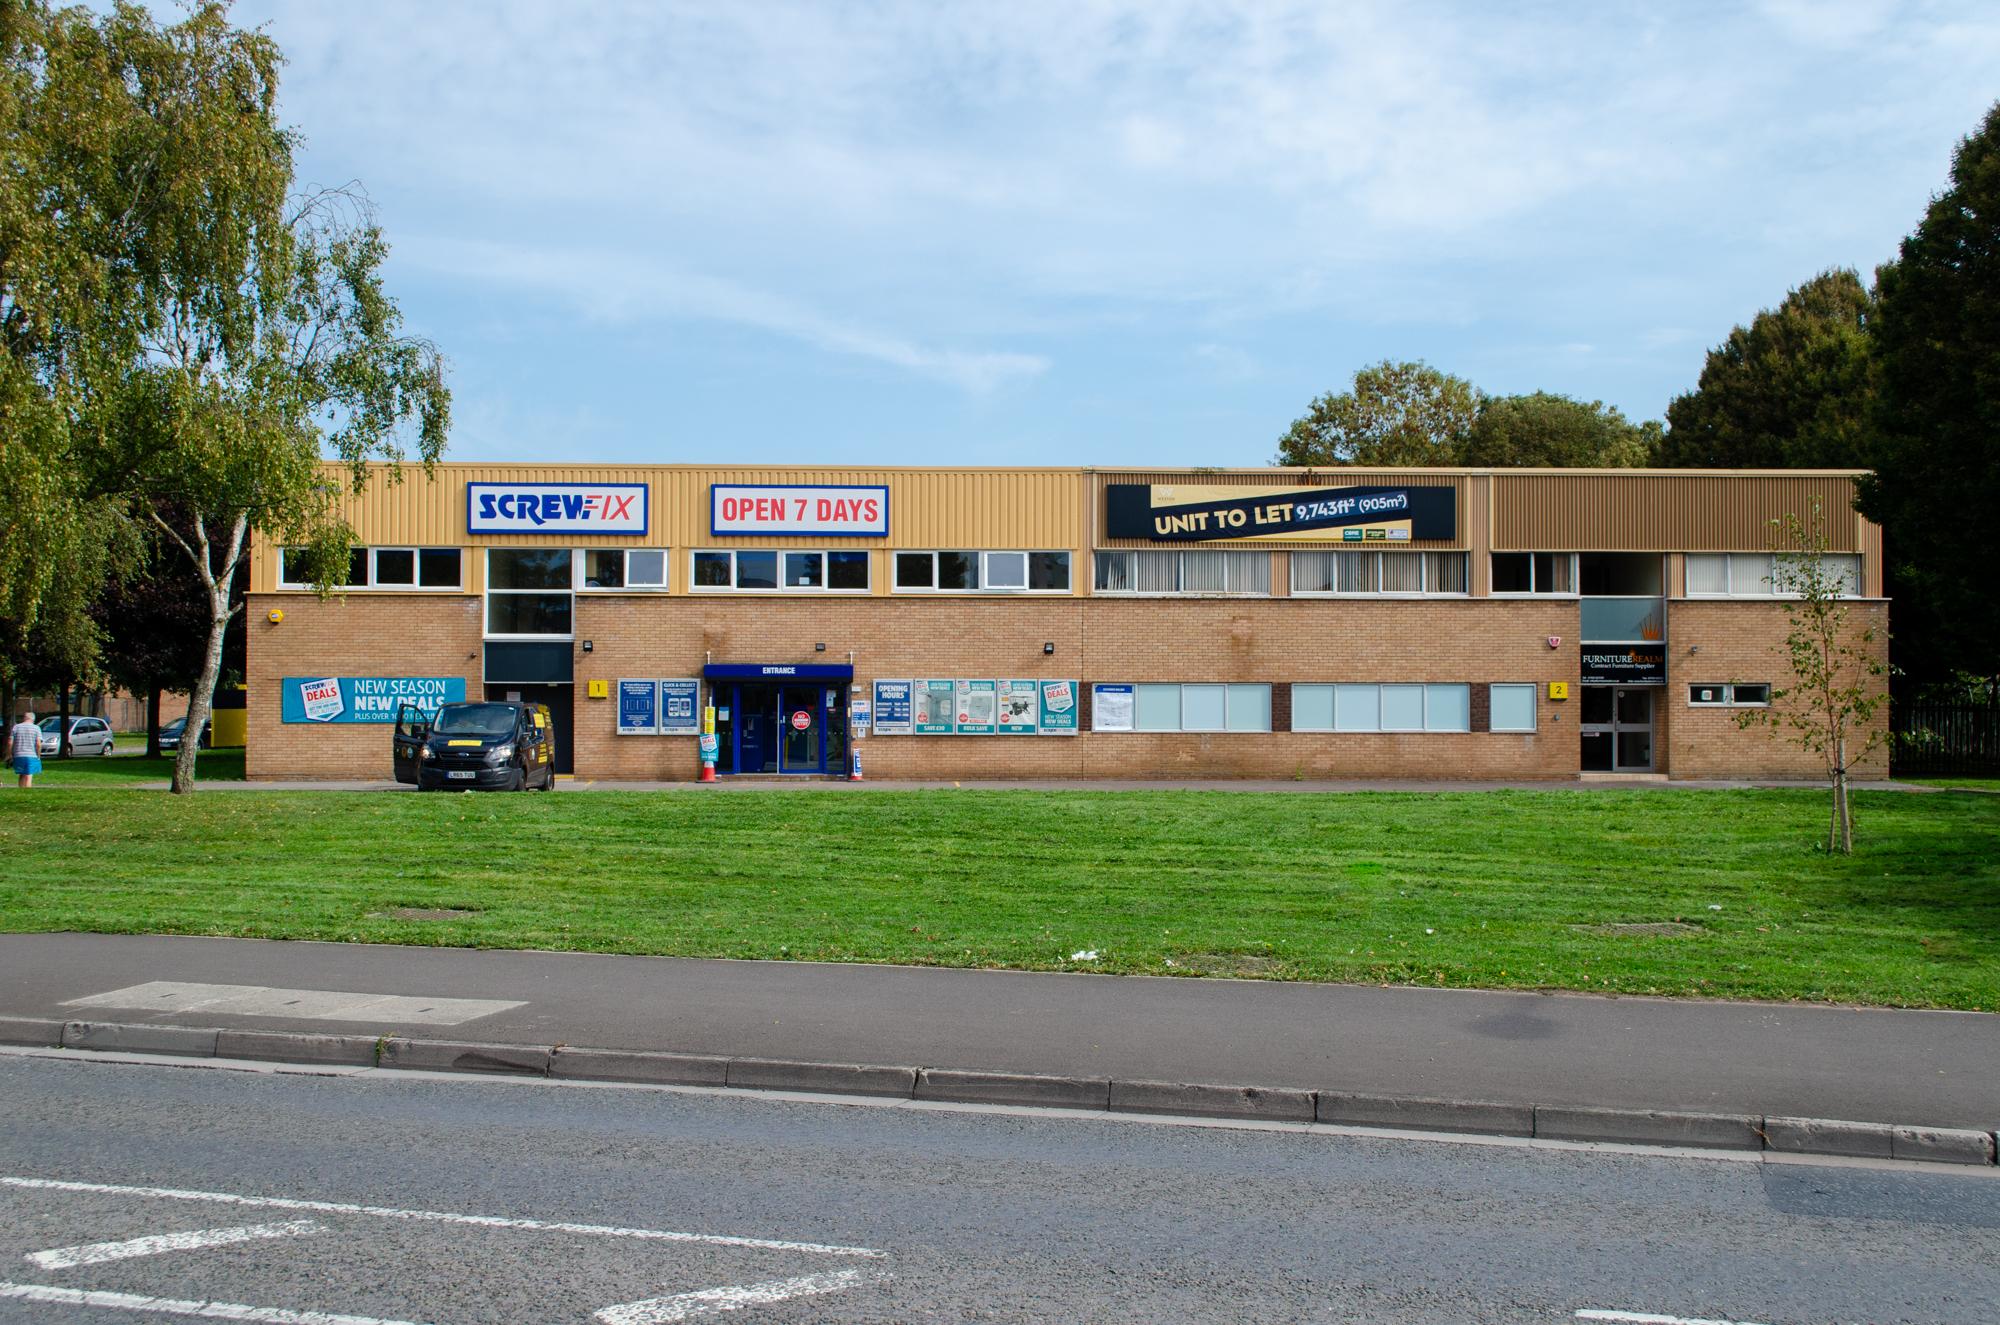 Weston Site Three Sixty Group 88